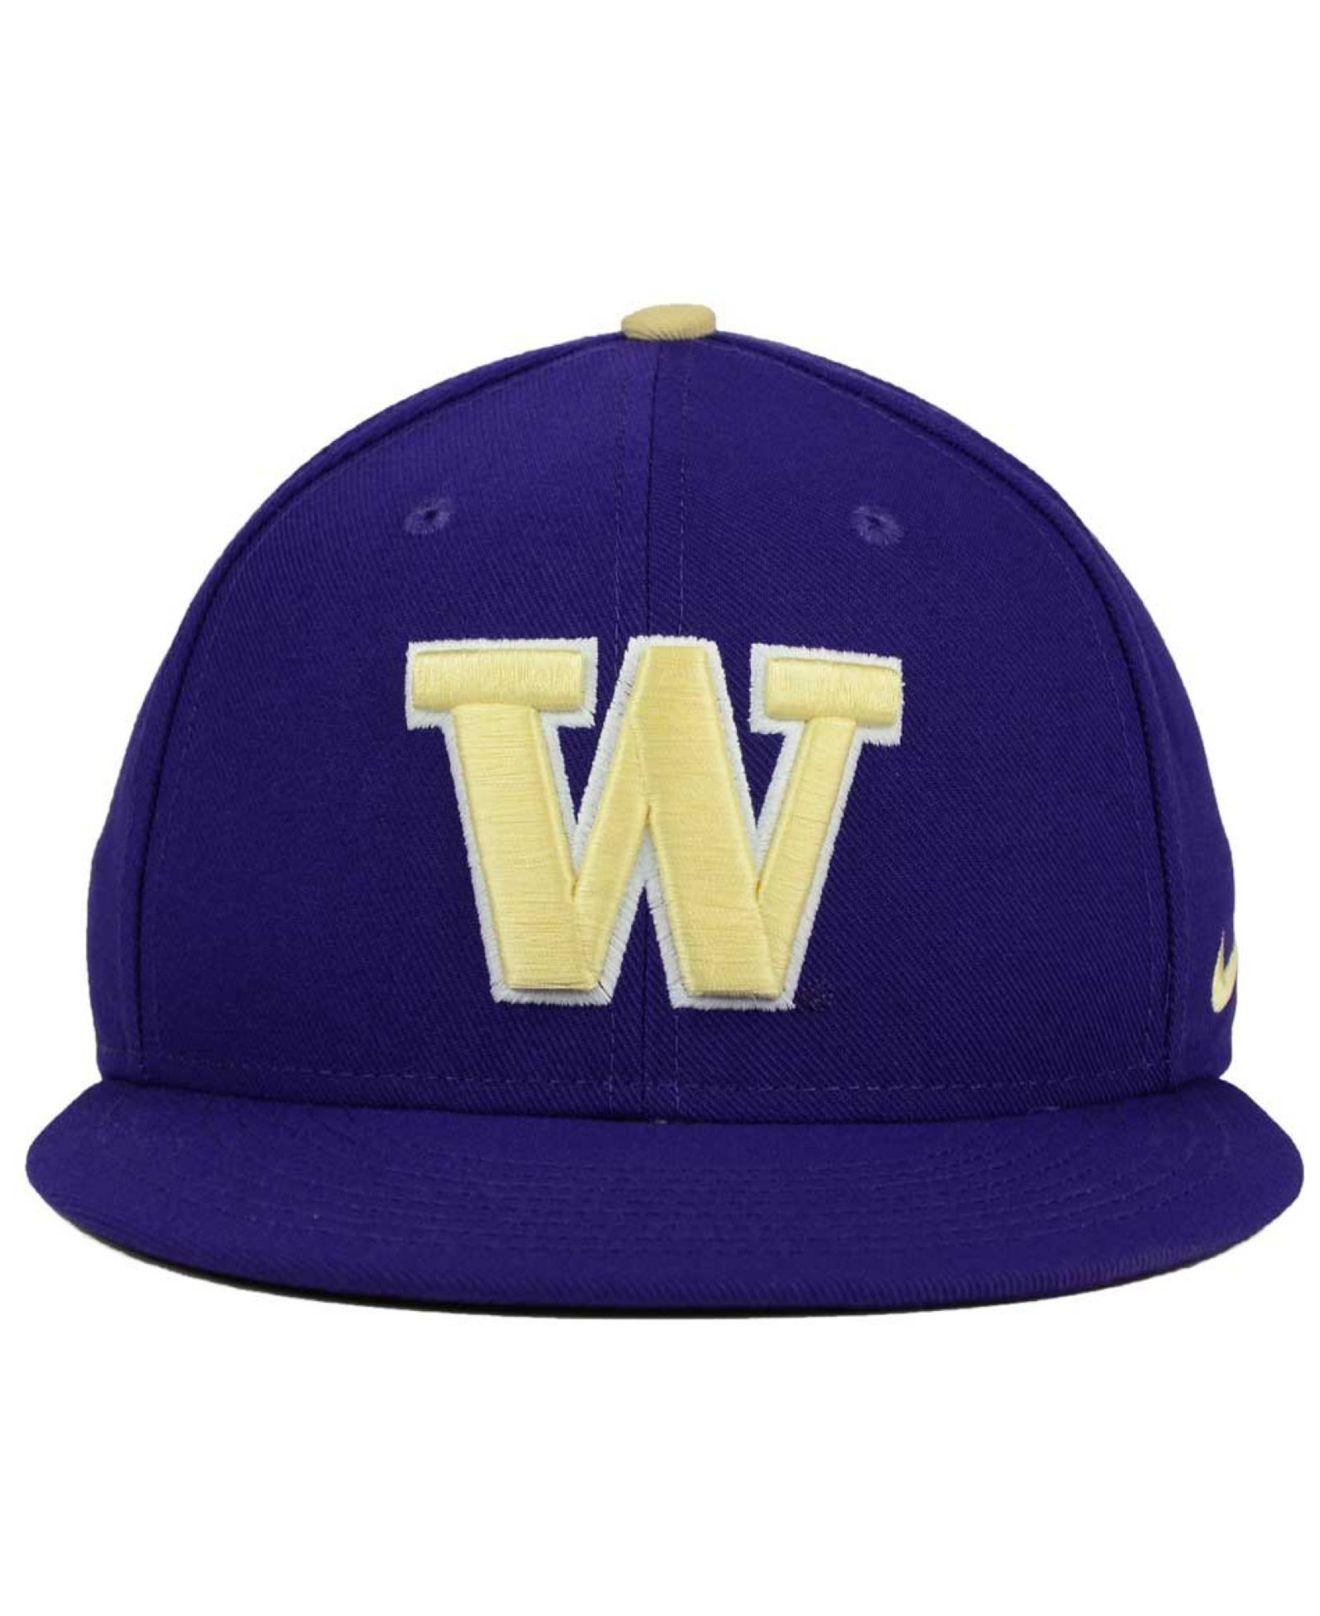 967696a02bc Lyst - Nike Washington Huskies True Hardwood Seasonal Cap in Blue ...